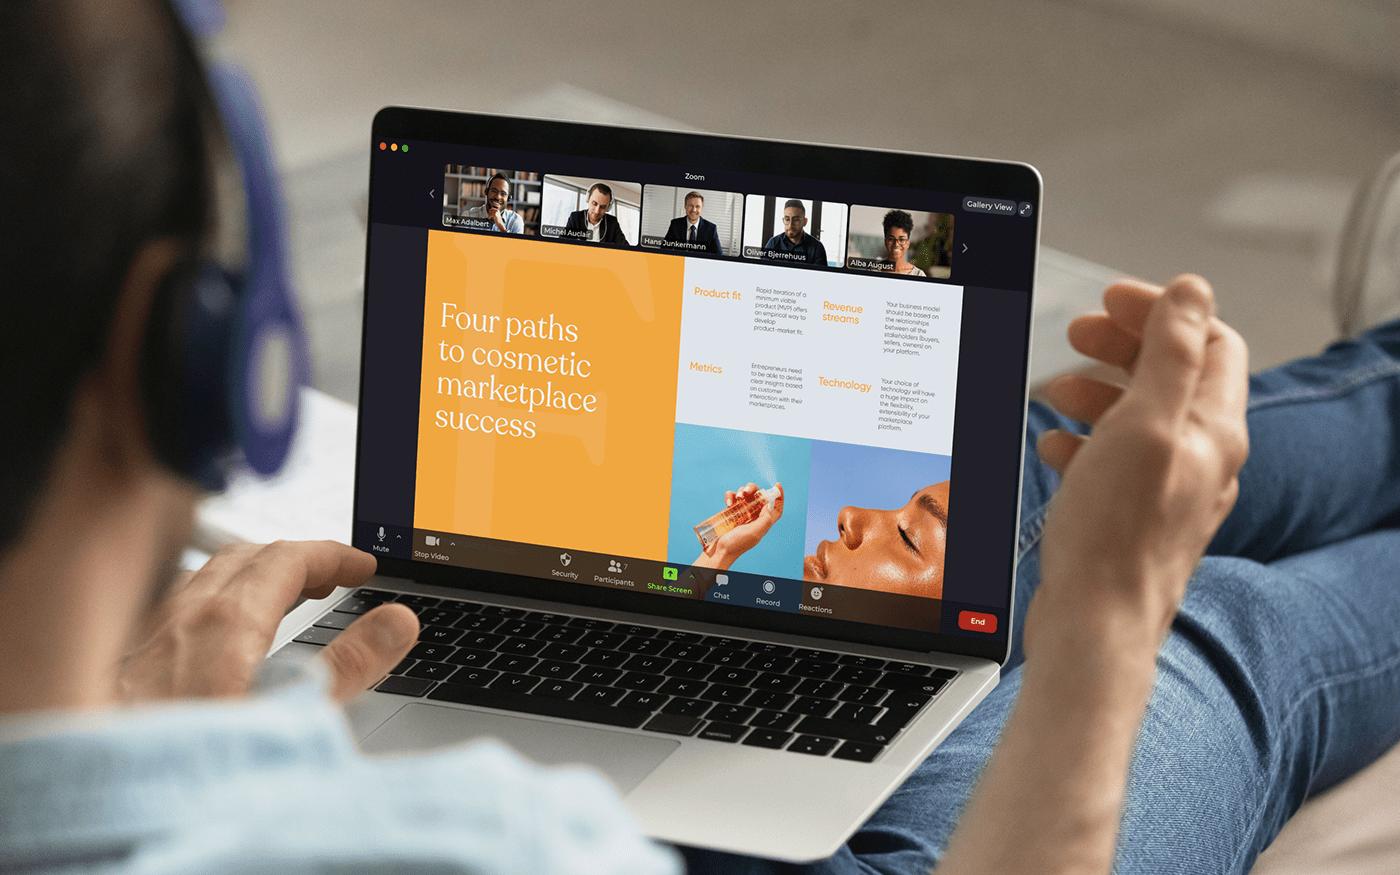 Fintech Fund Investment venture visionaire branding